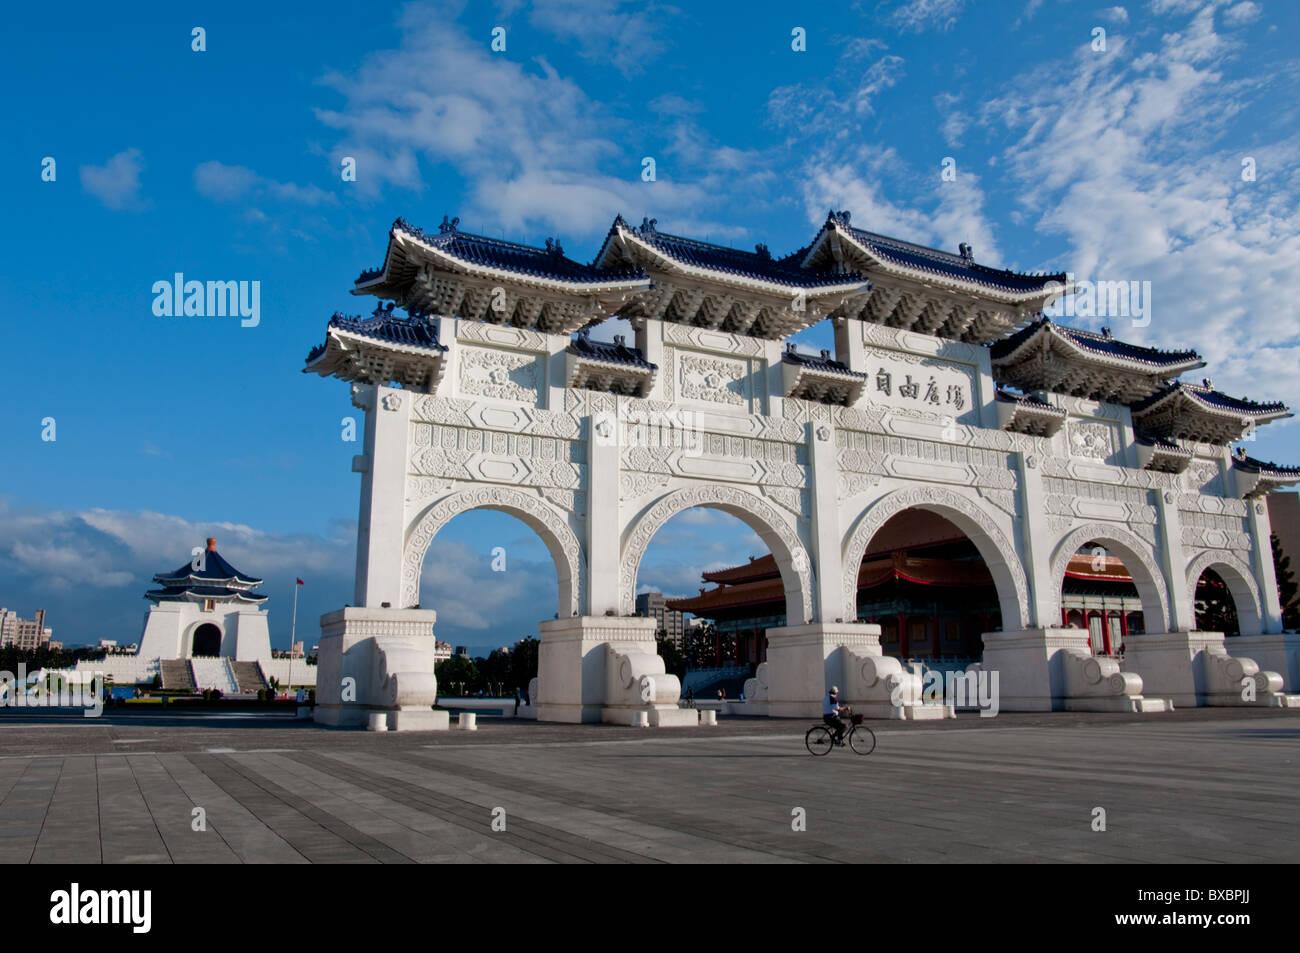 Asia, Taiwan, Taipei Chiang Kai Shek memorial hall arch luce diurna Immagini Stock